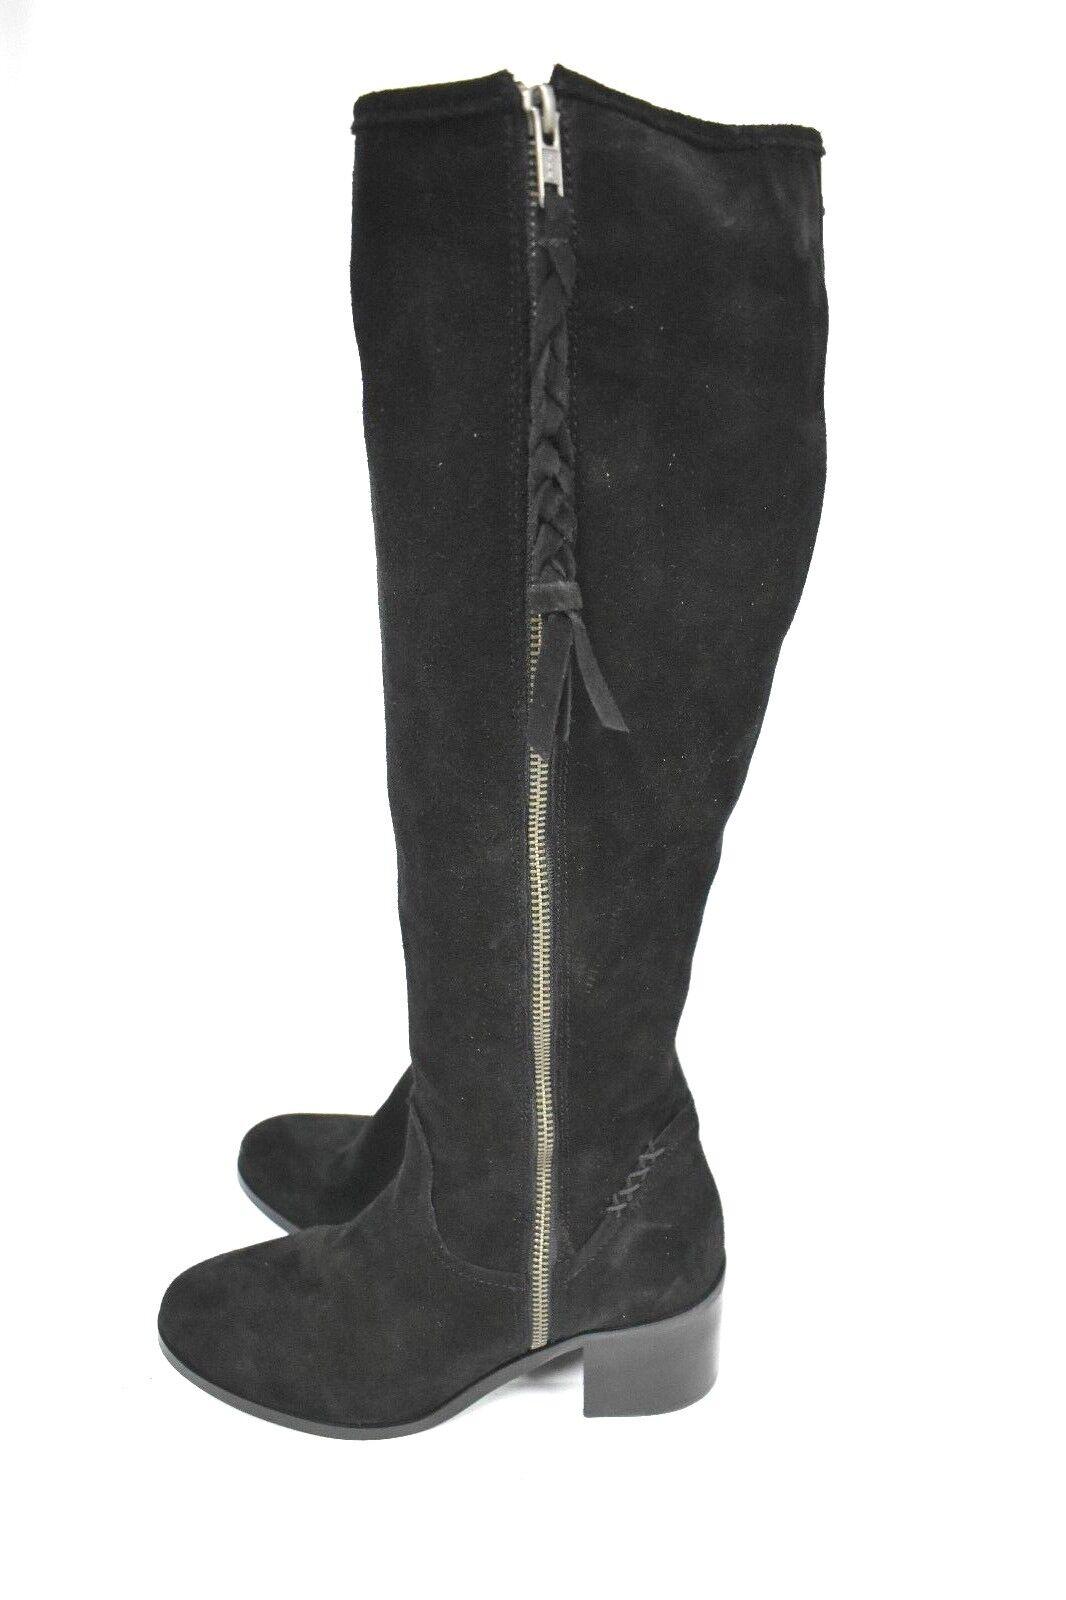 New Steve Madden Women's Lasso Lasso Lasso Black Knee High Boots size 8.5 02e1b8